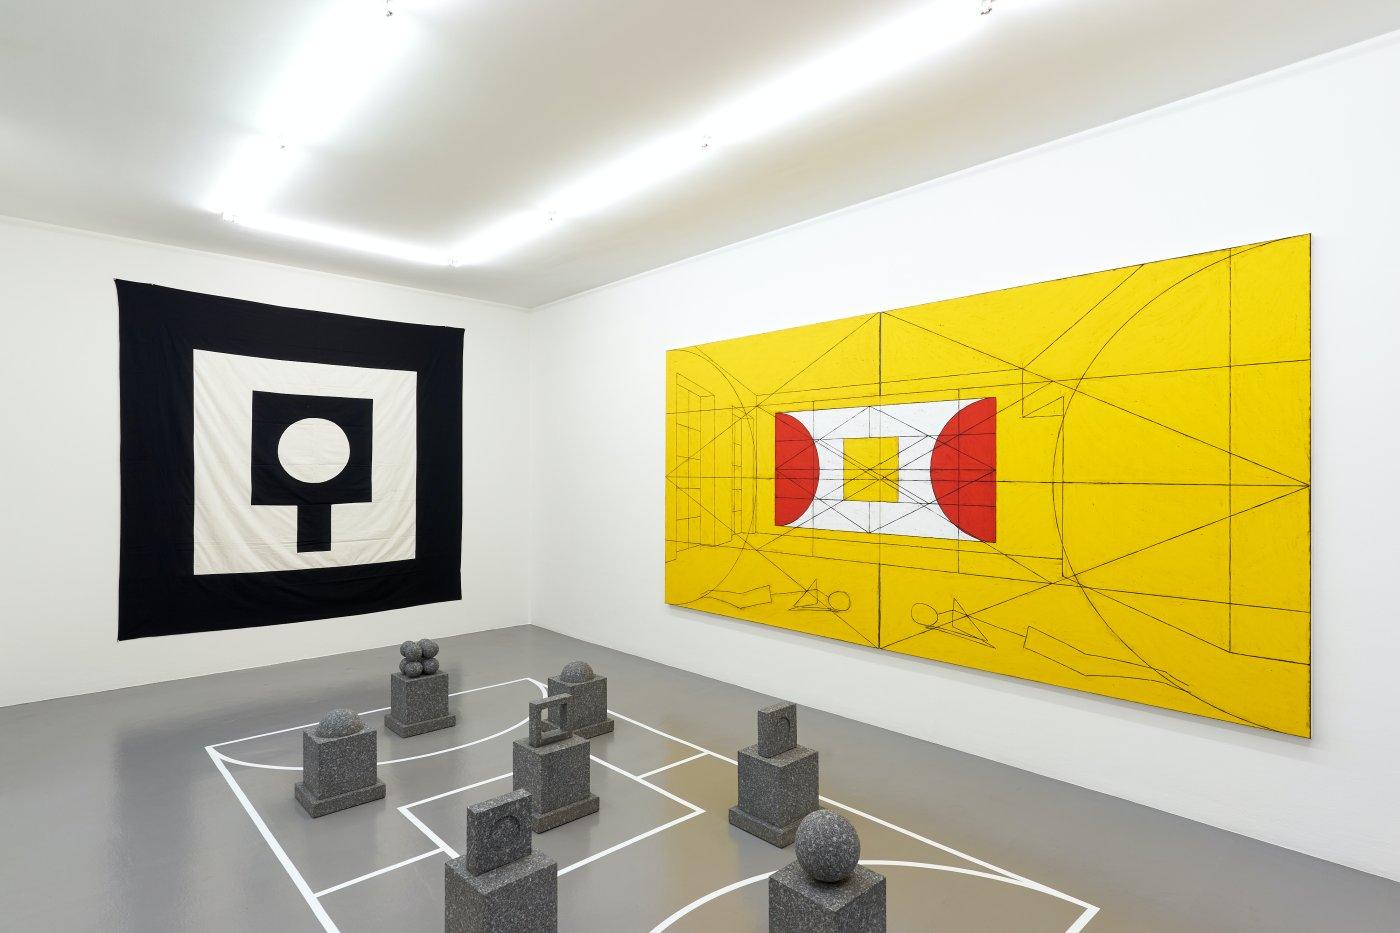 Mai 36 Galerie Matt Mullican 5